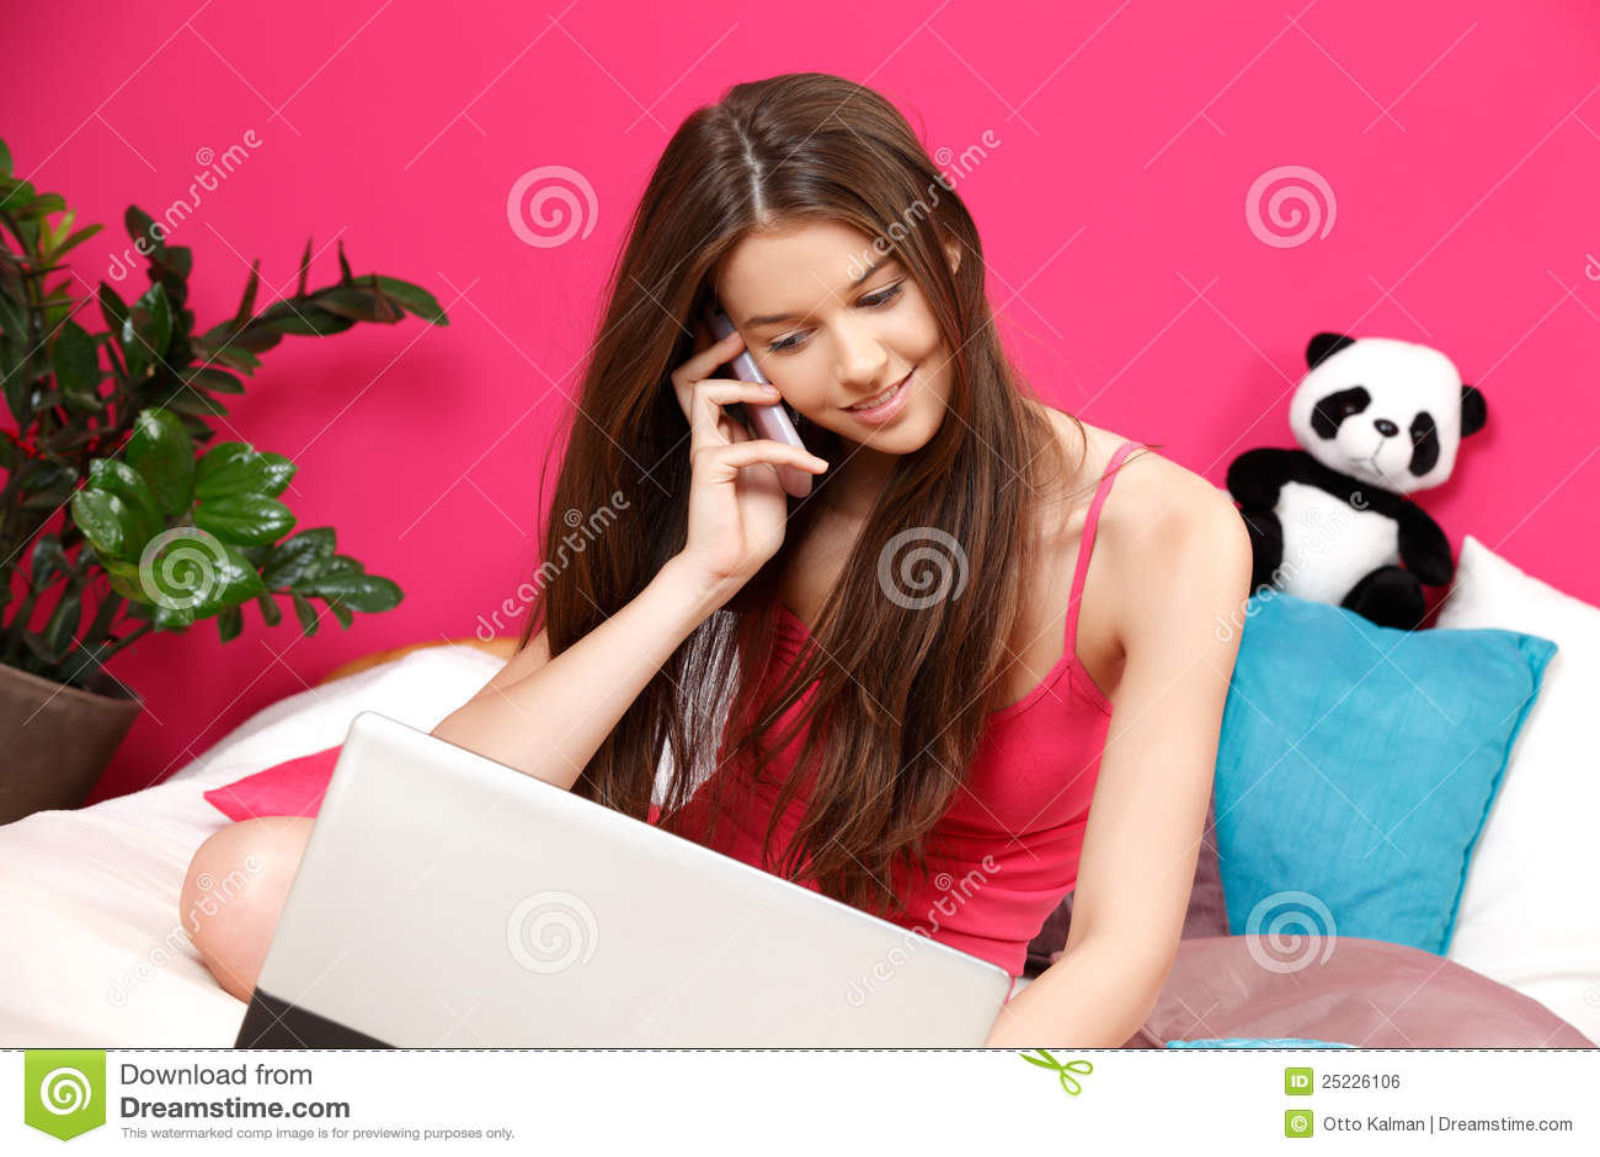 find a girlfriend teenager